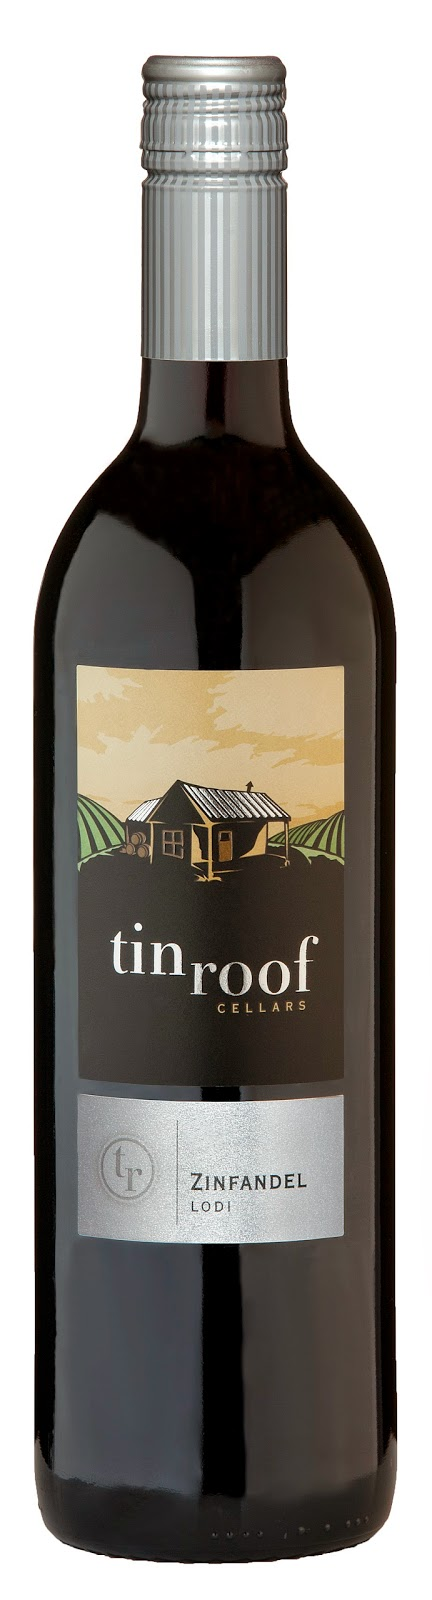 bottle of Tin Roof Cellars Zinfandel, 2011